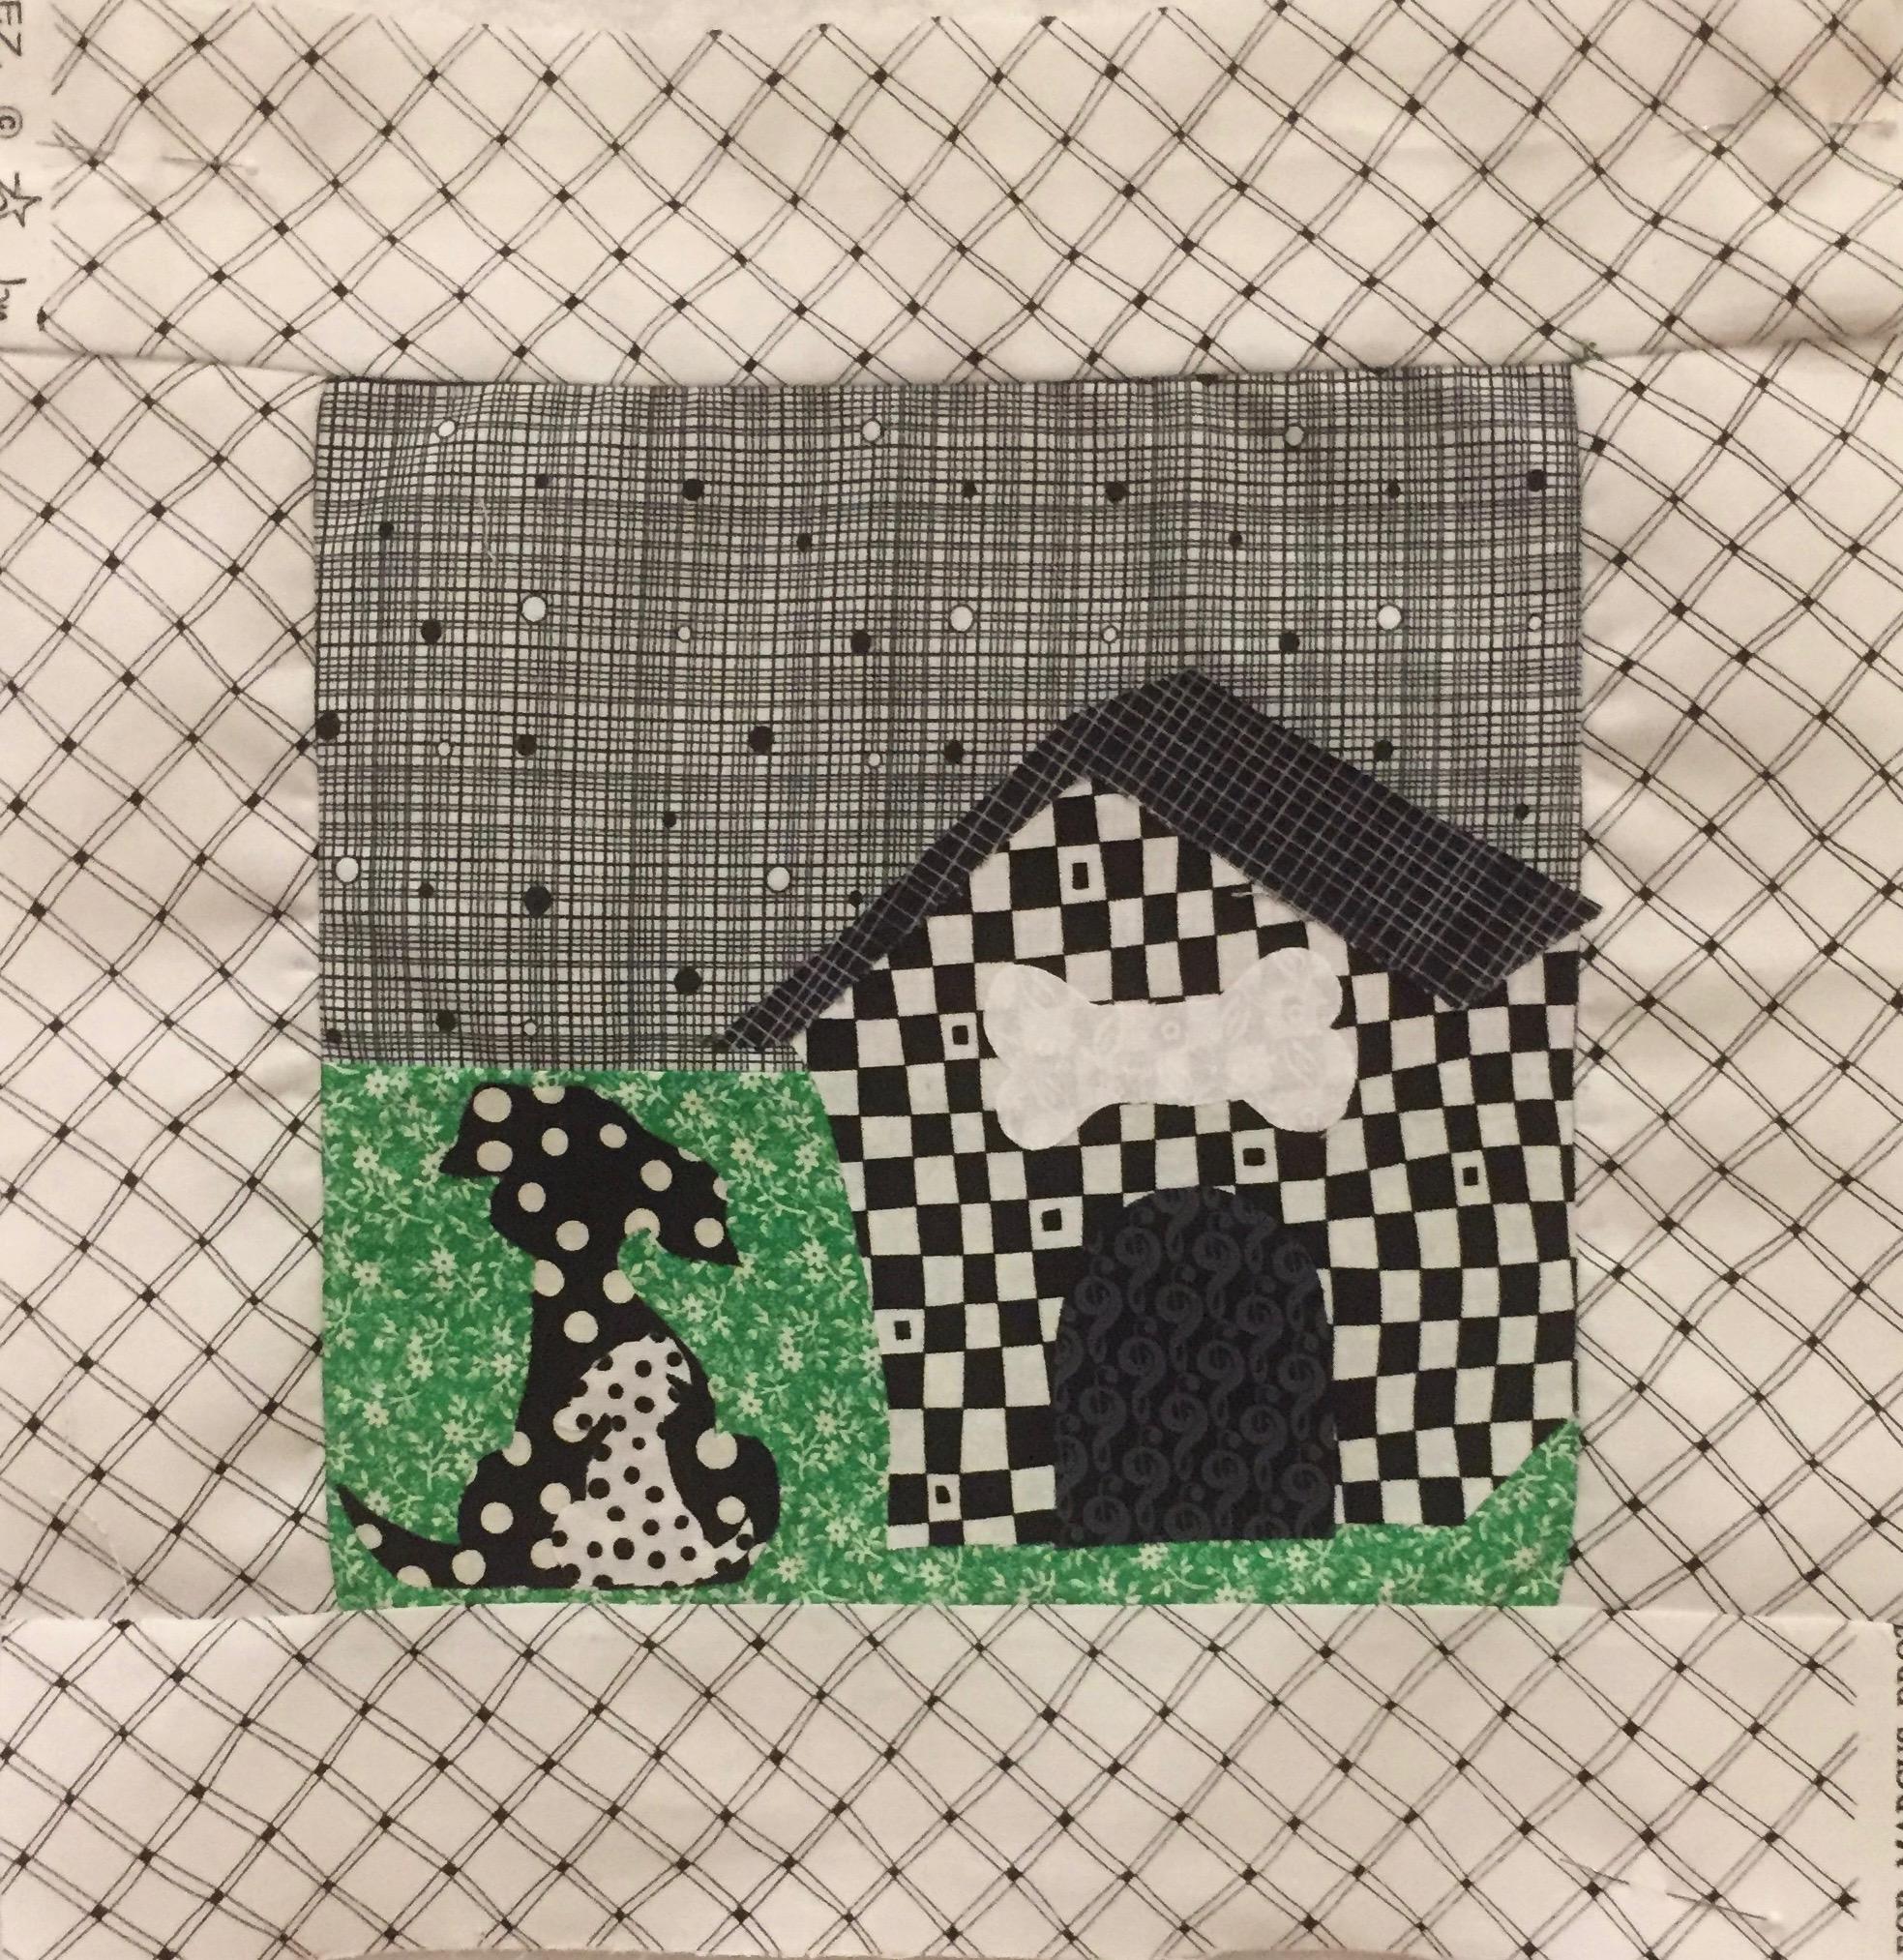 Dog House S Ravana.jpg